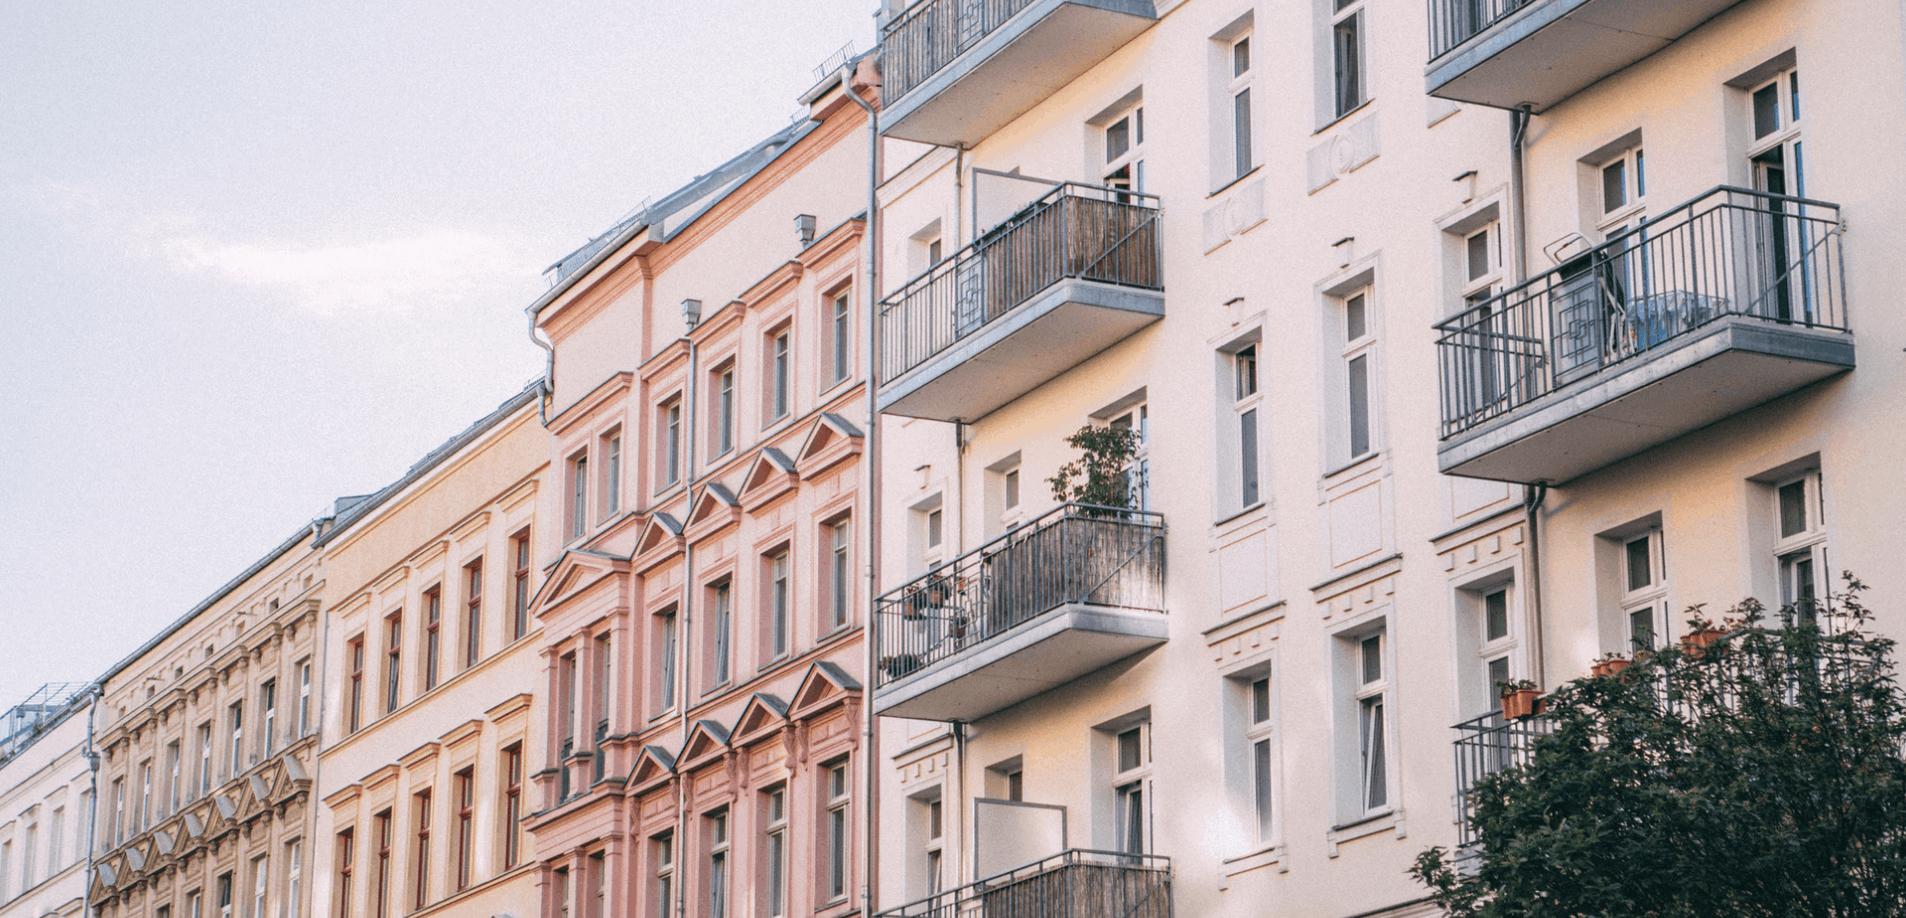 Real estate asset classes